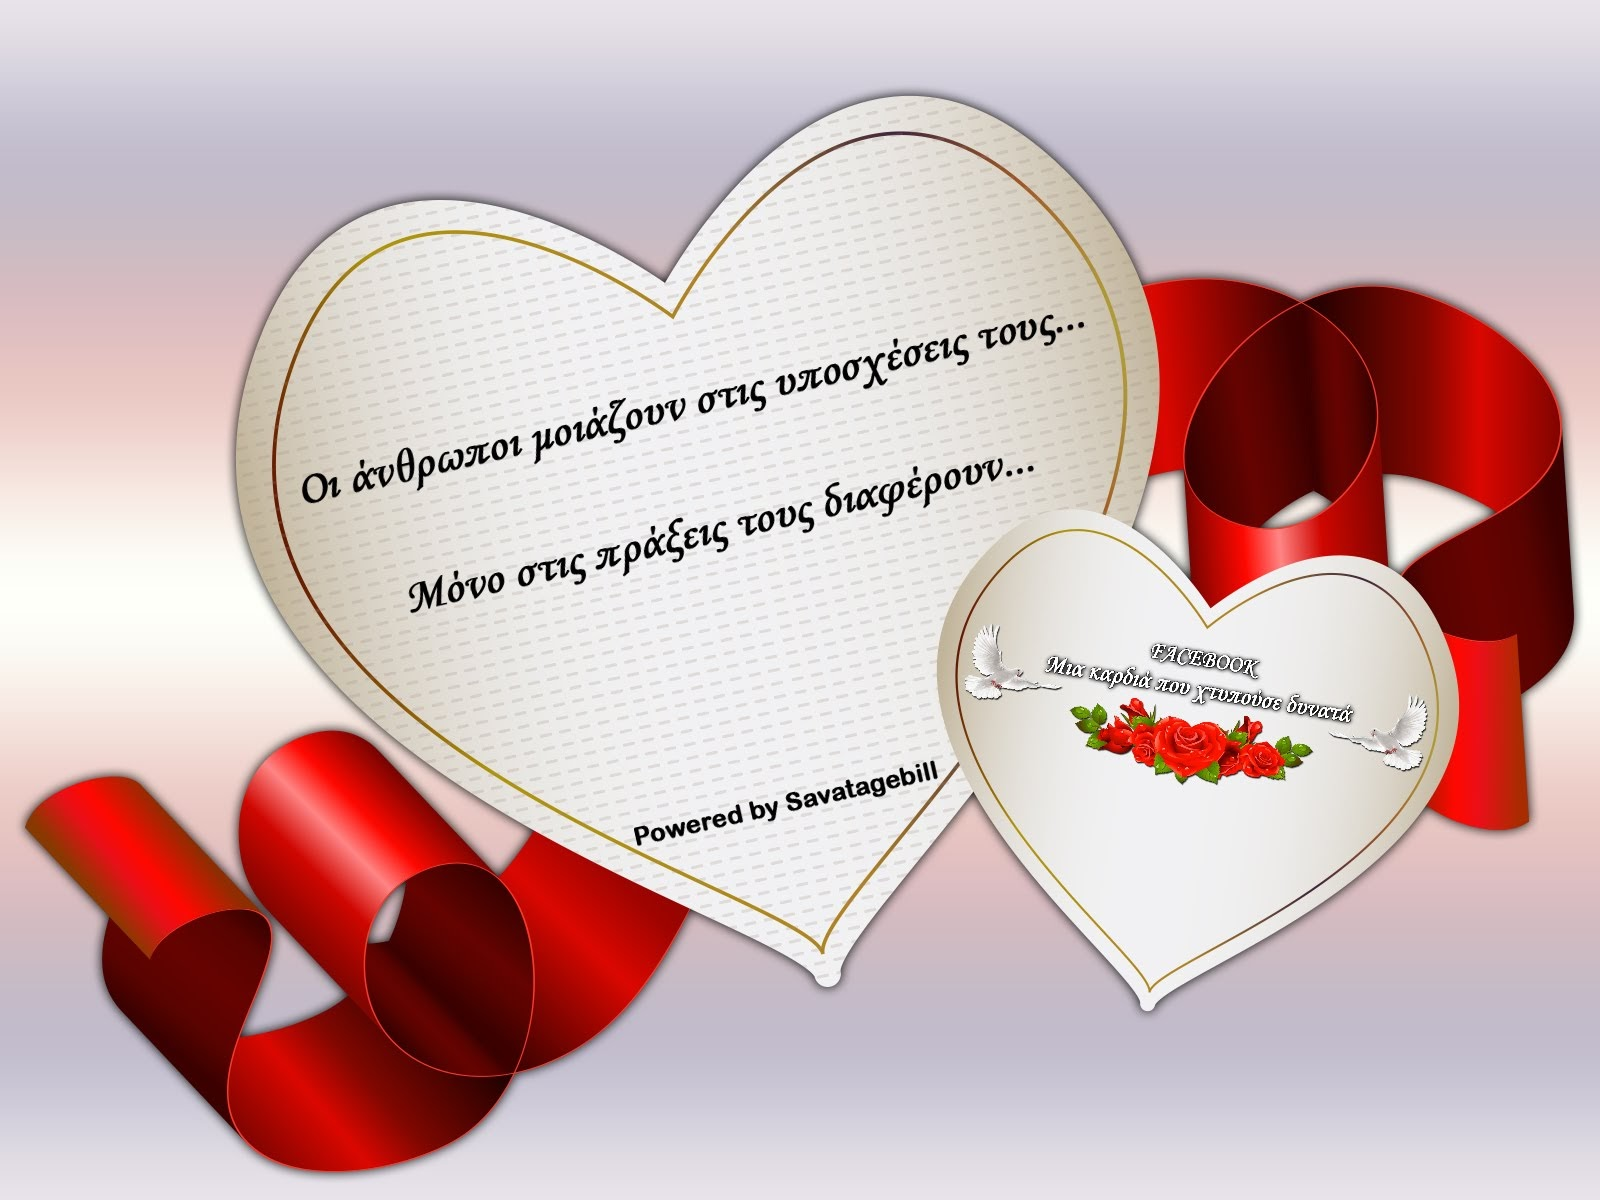 819a236014a Μια καρδιά που χτυπούσε δυνατά: Oι άνθρωποι μοιάζουν στις υποσχέσεις ...